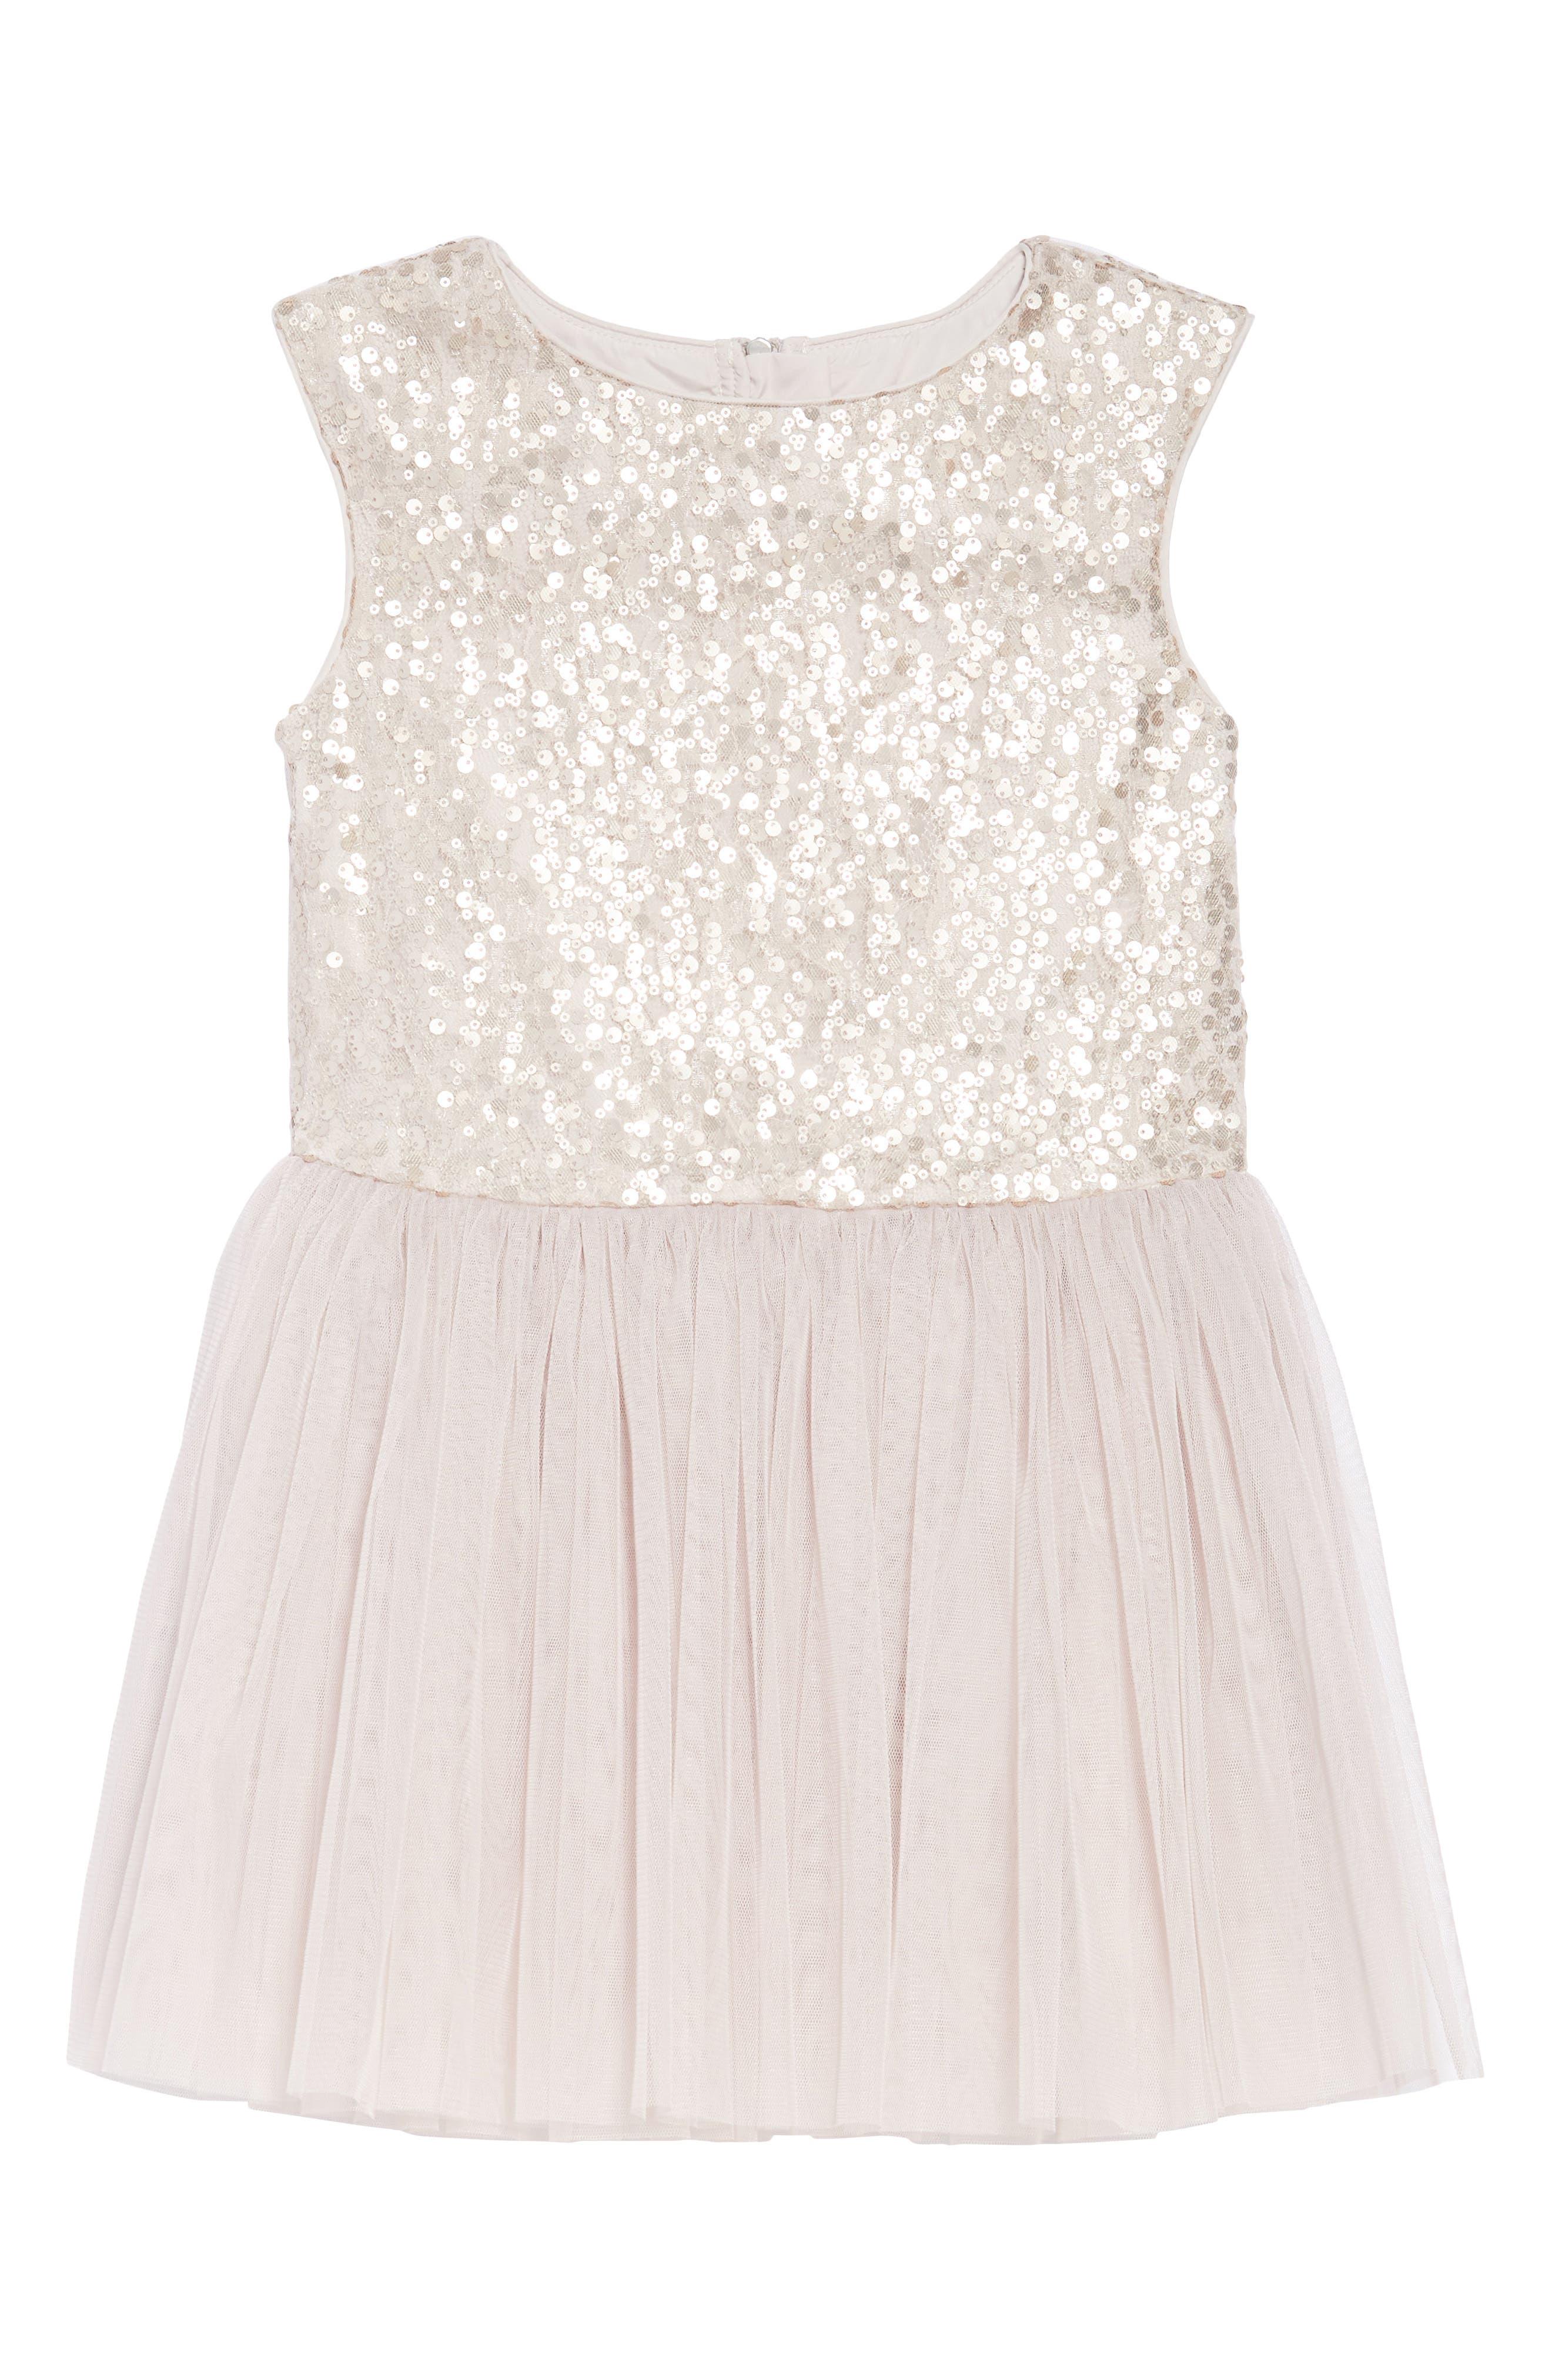 Sequin & Tulle Dress,                             Main thumbnail 1, color,                             650